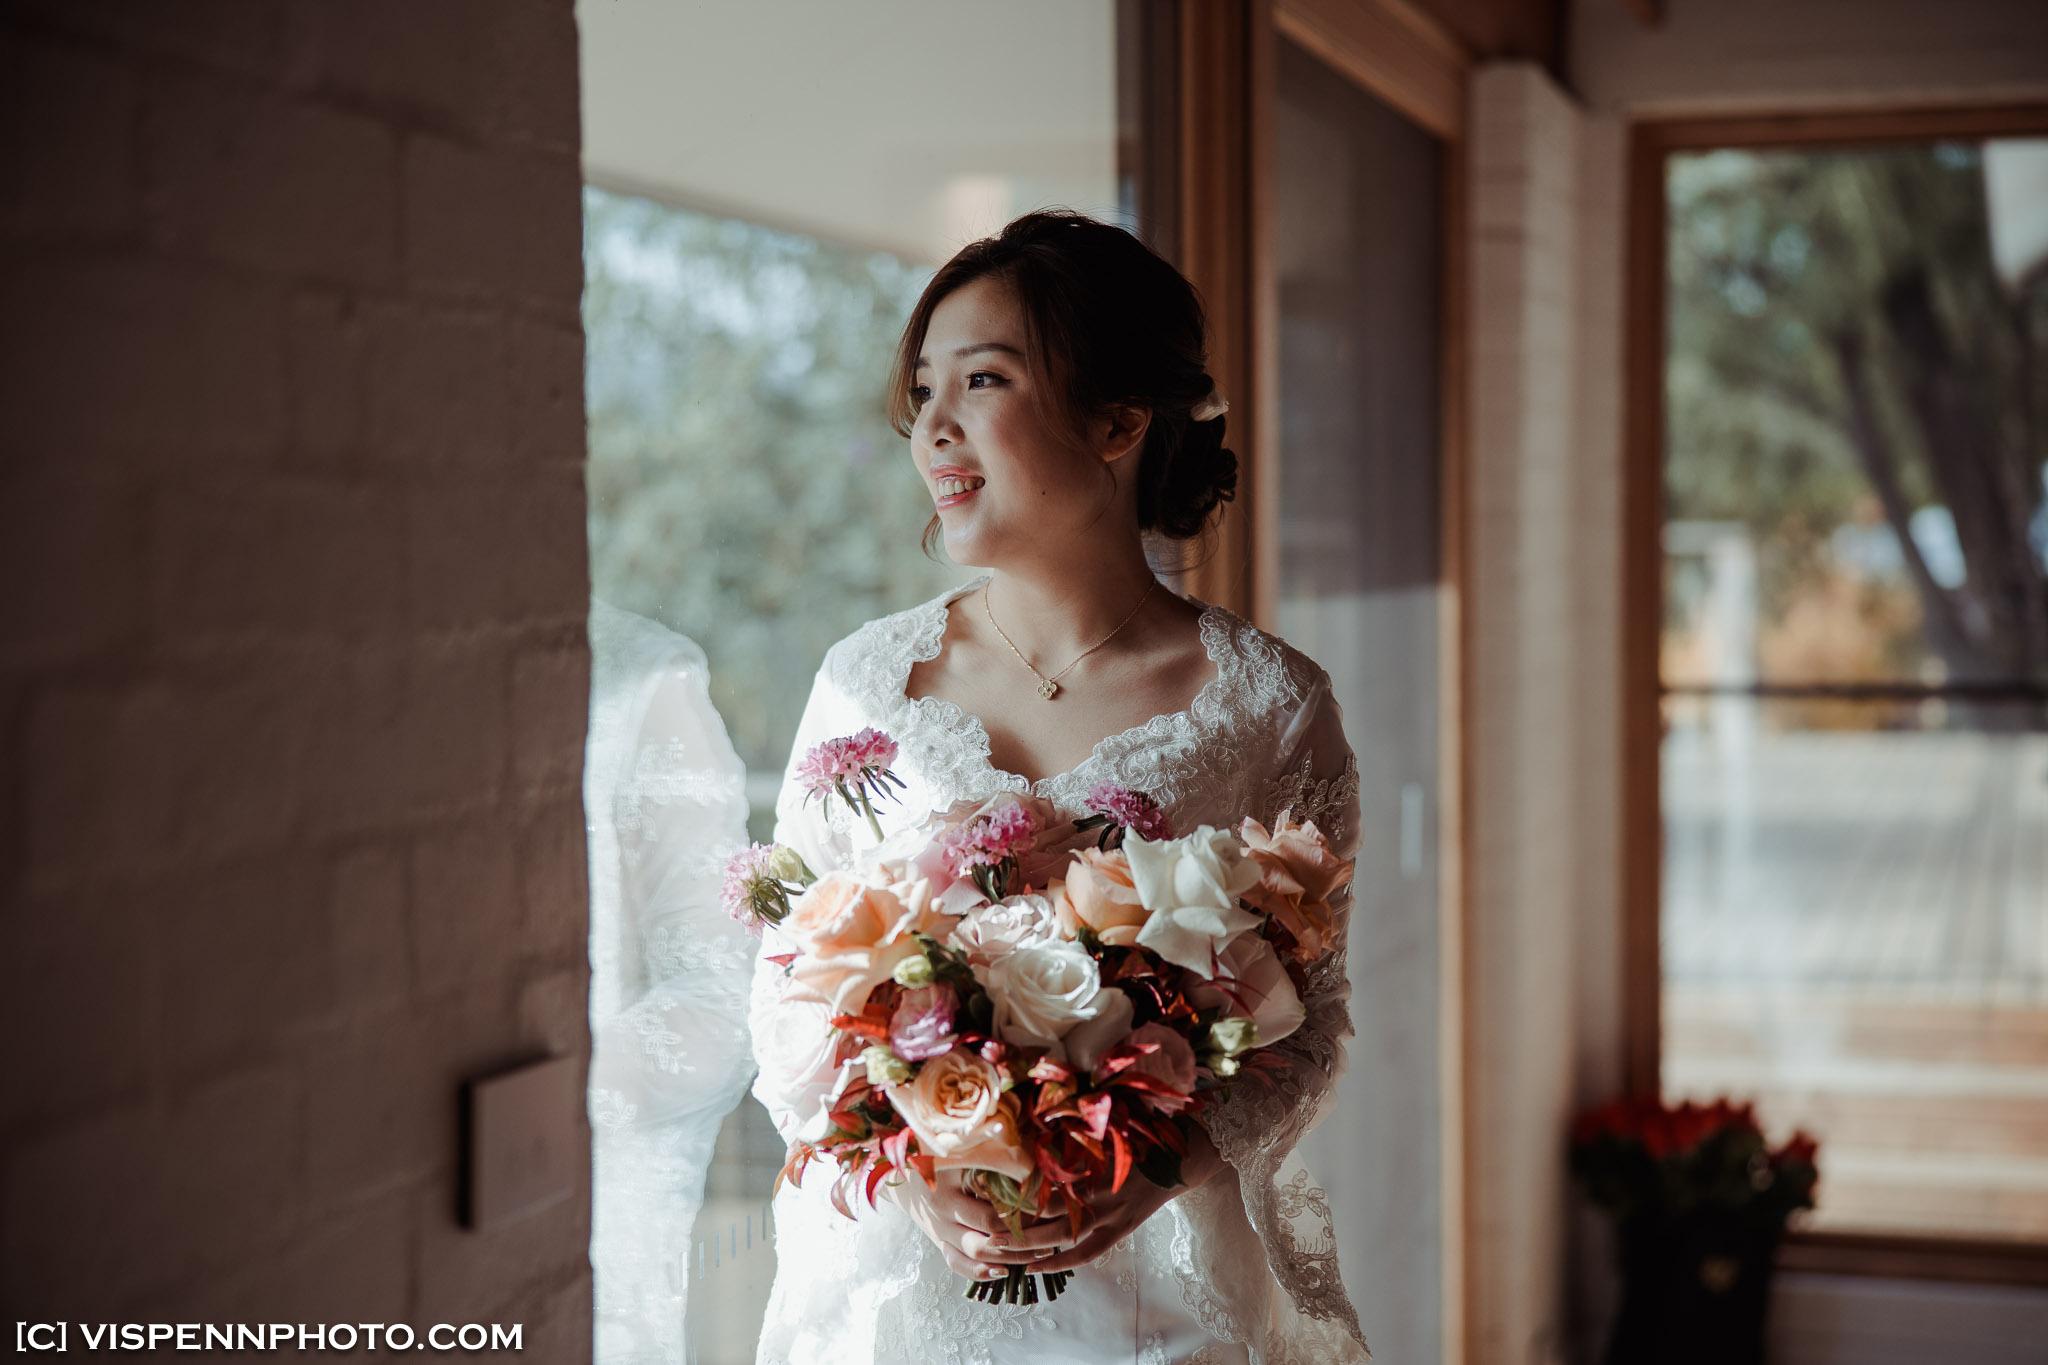 WEDDING DAY Photography Melbourne VISPENN 墨尔本 婚礼跟拍 婚礼摄像 婚礼摄影 结婚照 登记照 DominicHelen 1P 2213 EOSR VISPENN